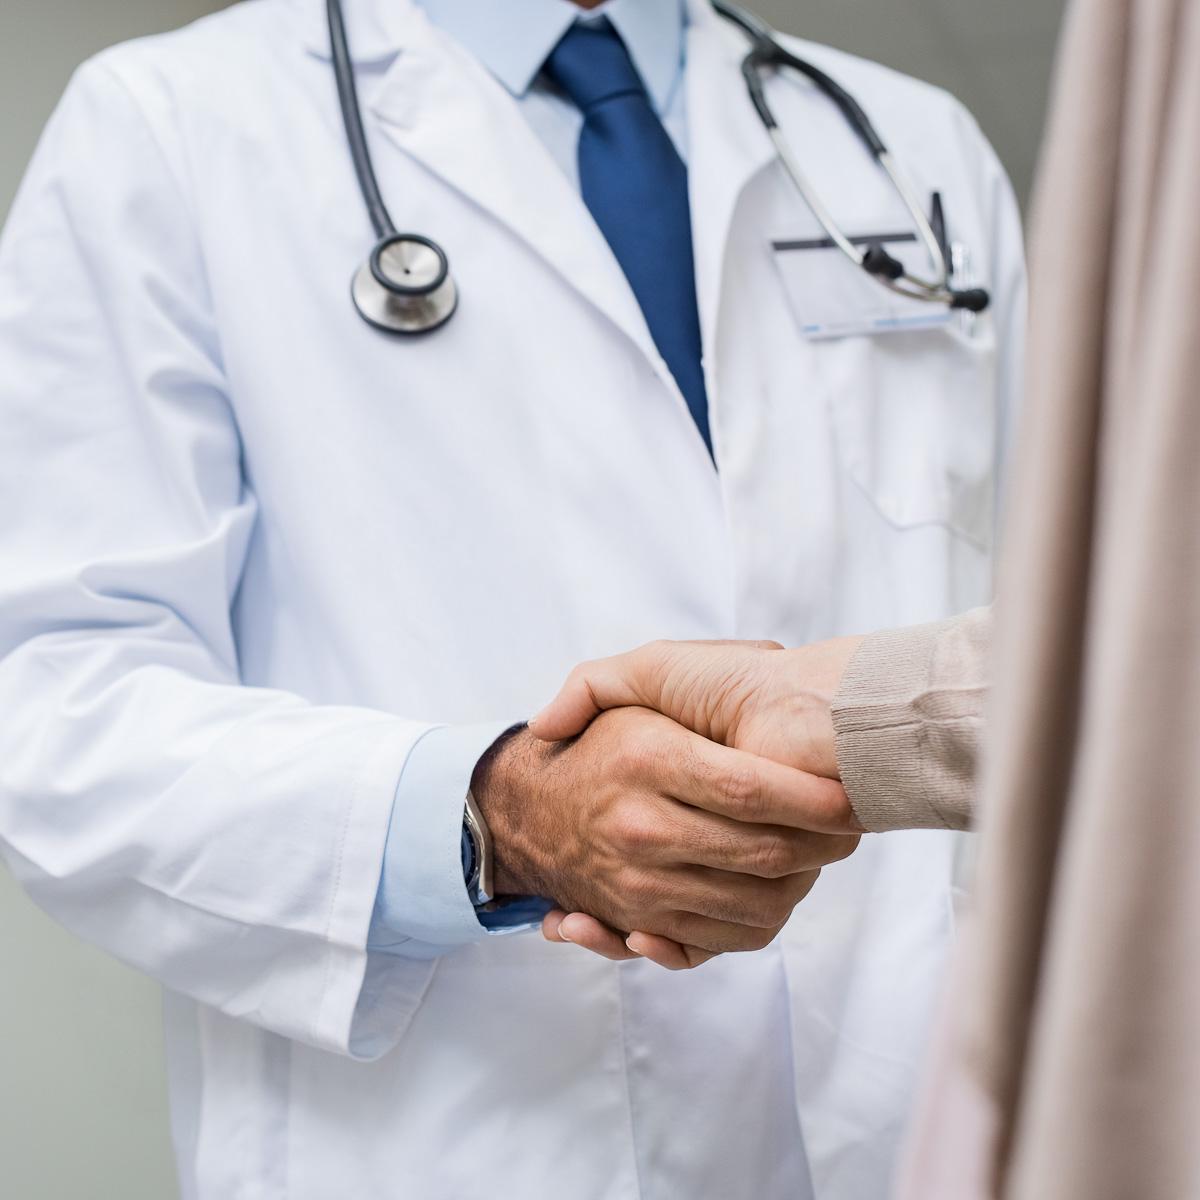 doctor-patient-hair-loss-mens-hair-grooming-man-for-himself